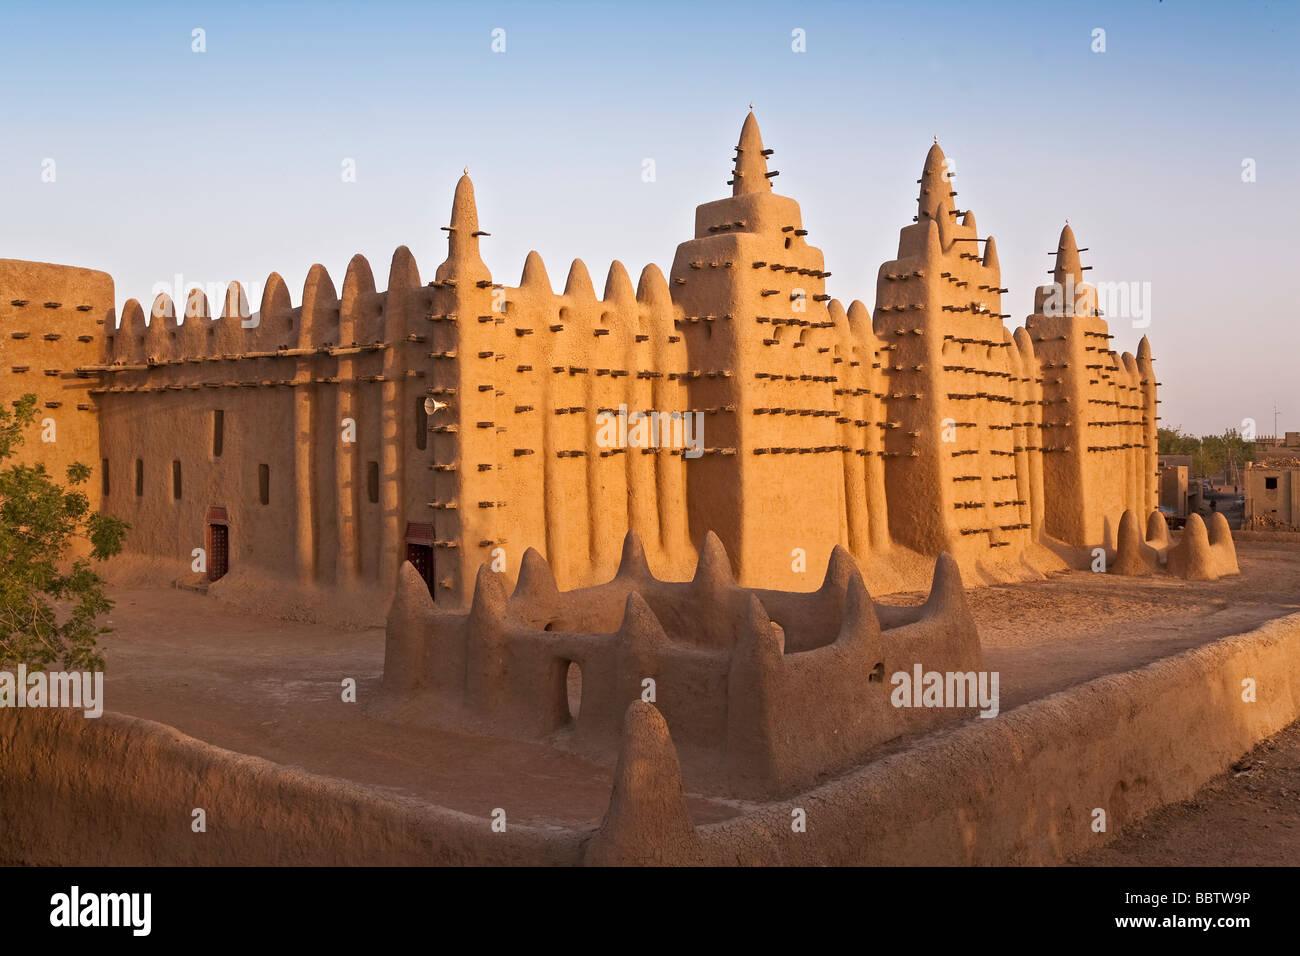 Great Mosque of Djenne, Djenne, Mopti Region, Niger Inland Delta, Mali, West Africa Stock Photo